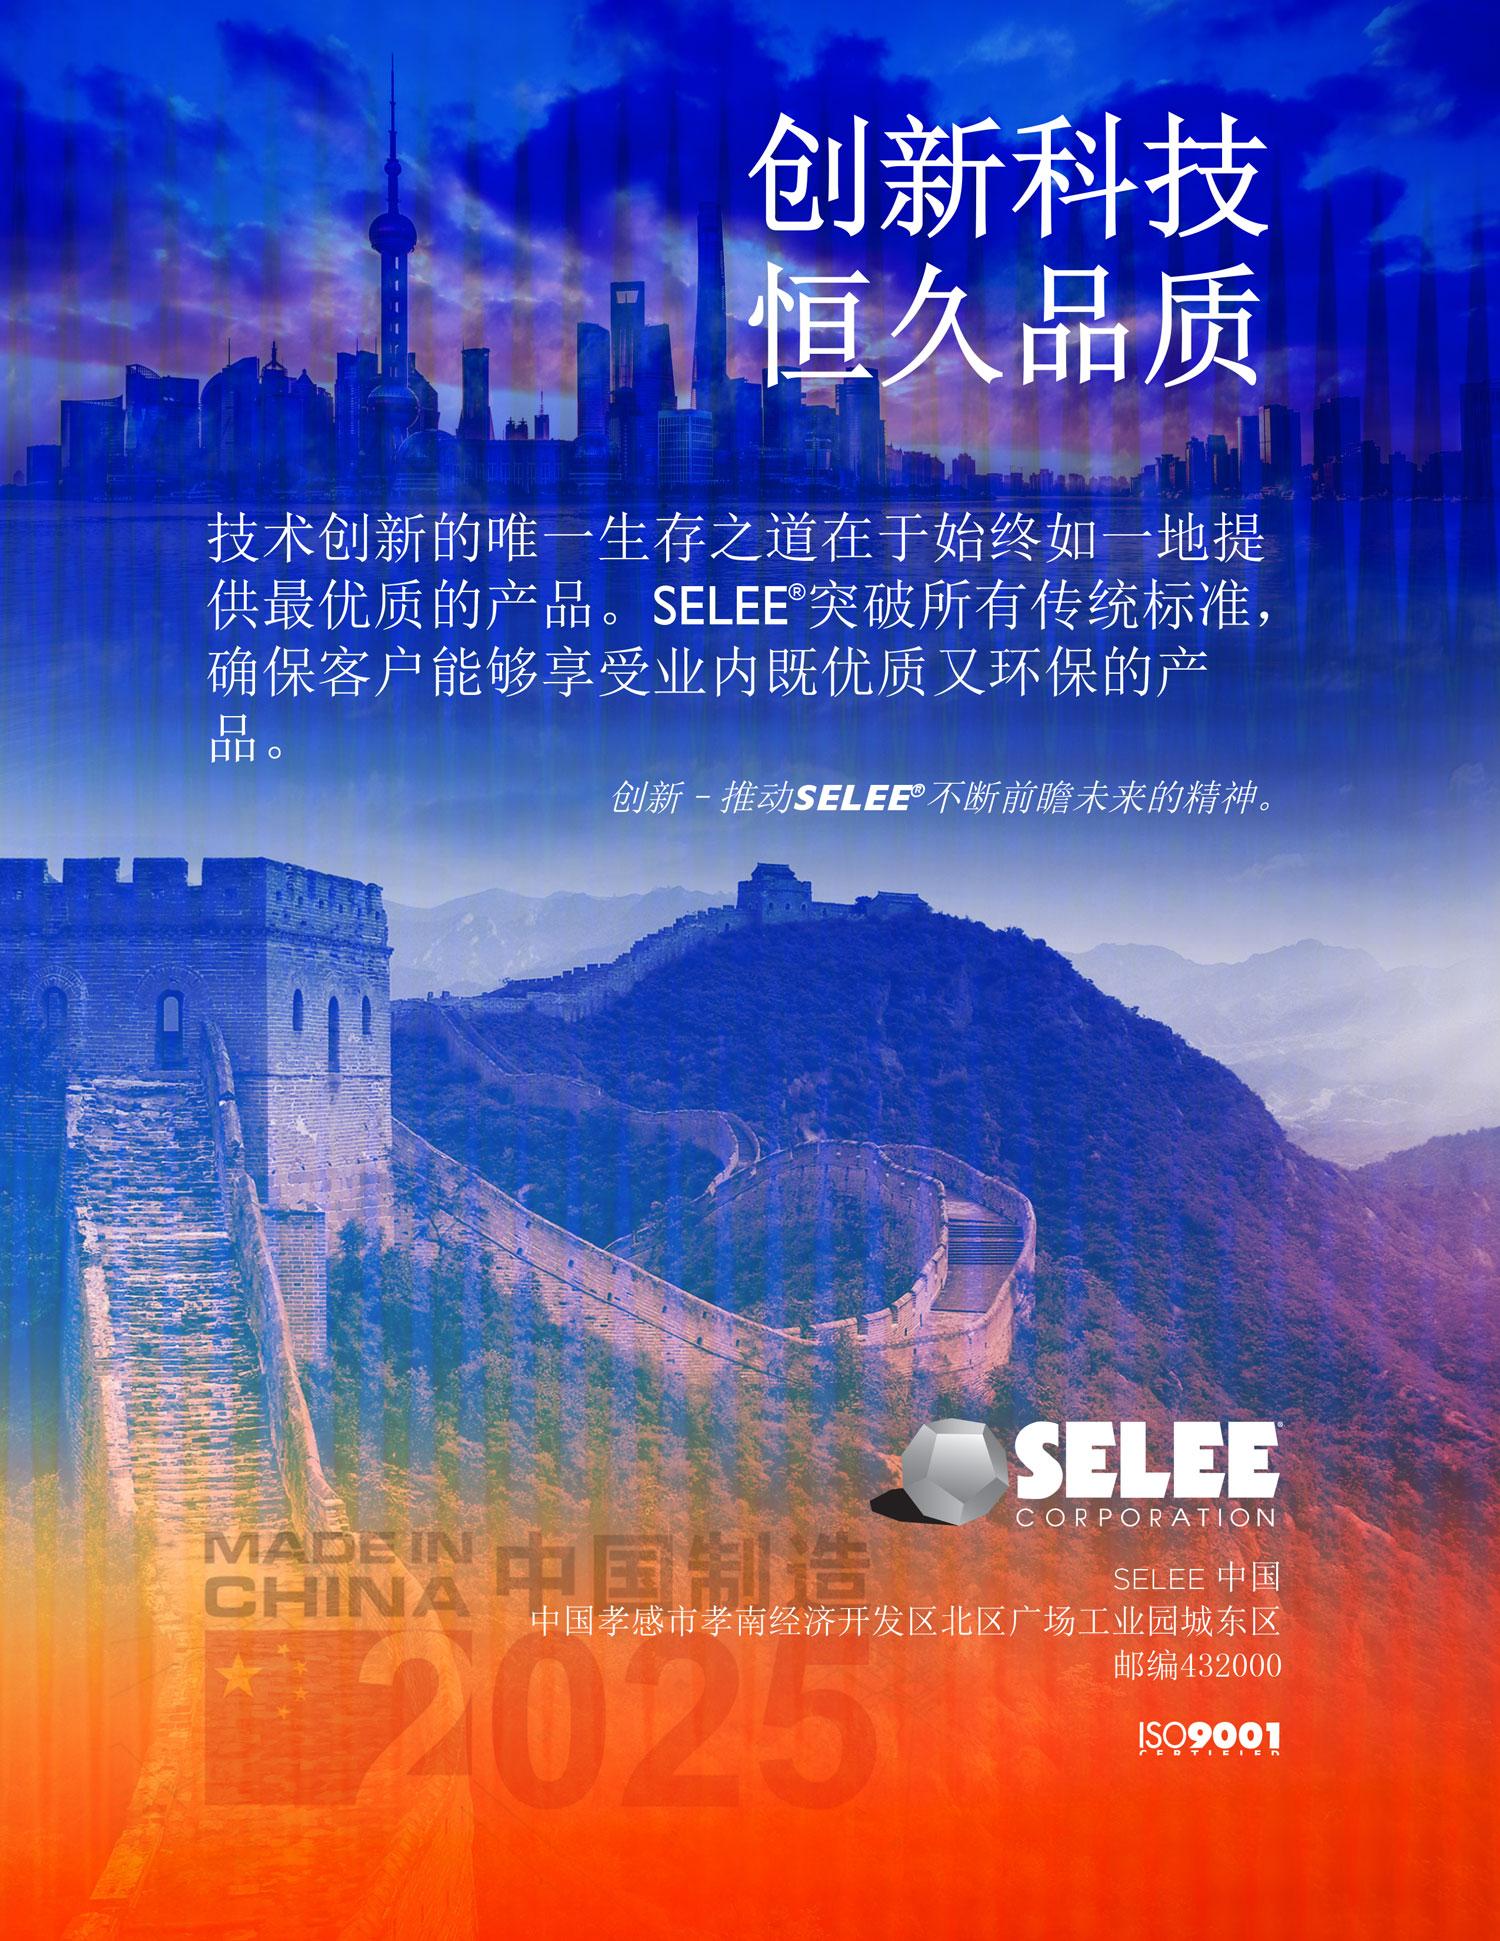 China-Ad_translated-Web.jpg